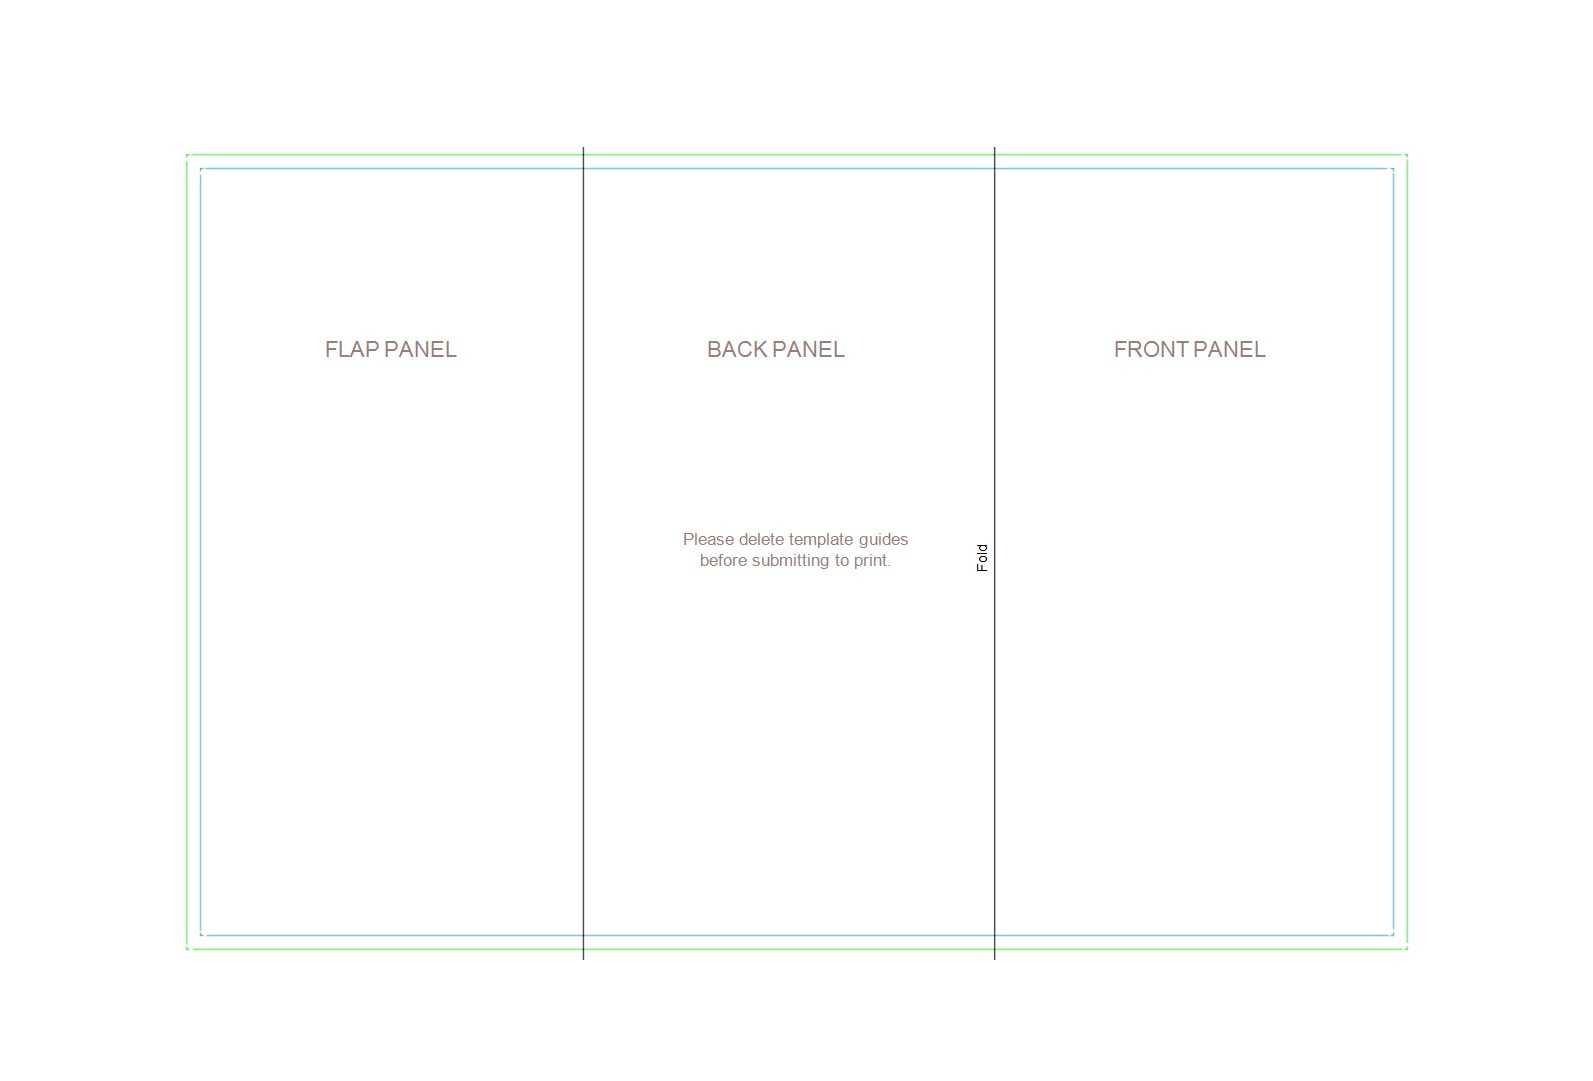 50 Free Pamphlet Templates [Word / Google Docs] ᐅ Templatelab For Google Drive Templates Brochure